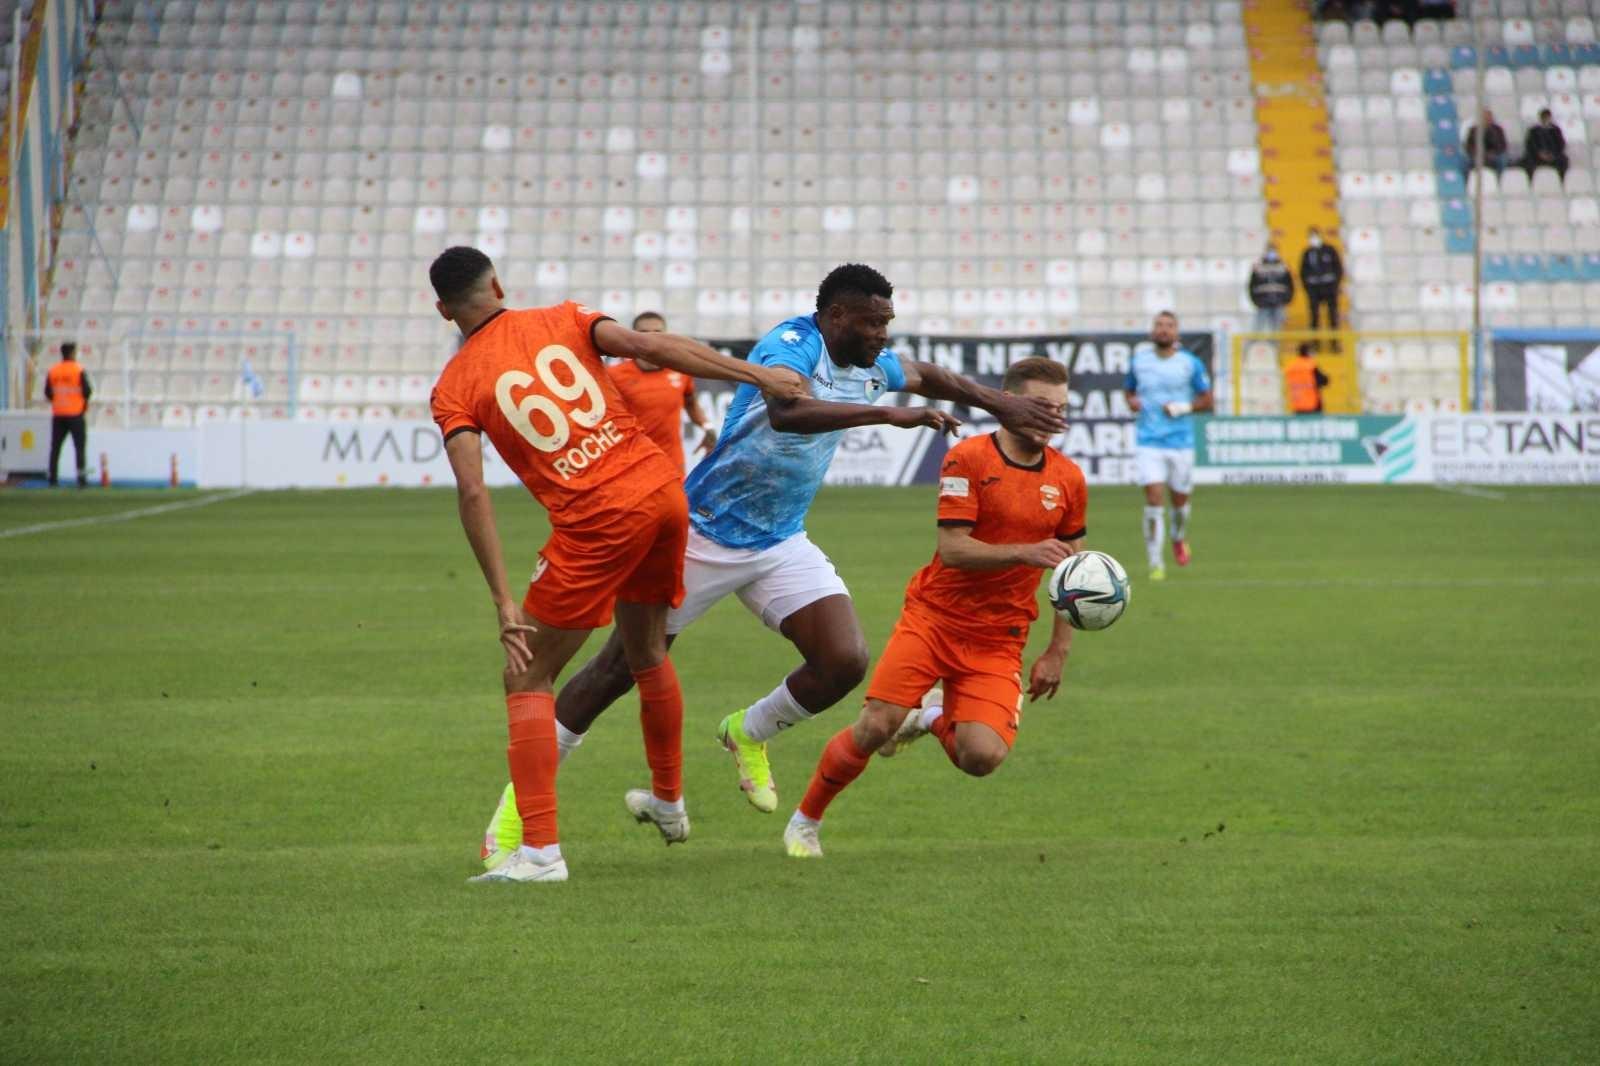 TFF 1. Lig: BB Erzurumspor: 3 – Adanaspor: 1